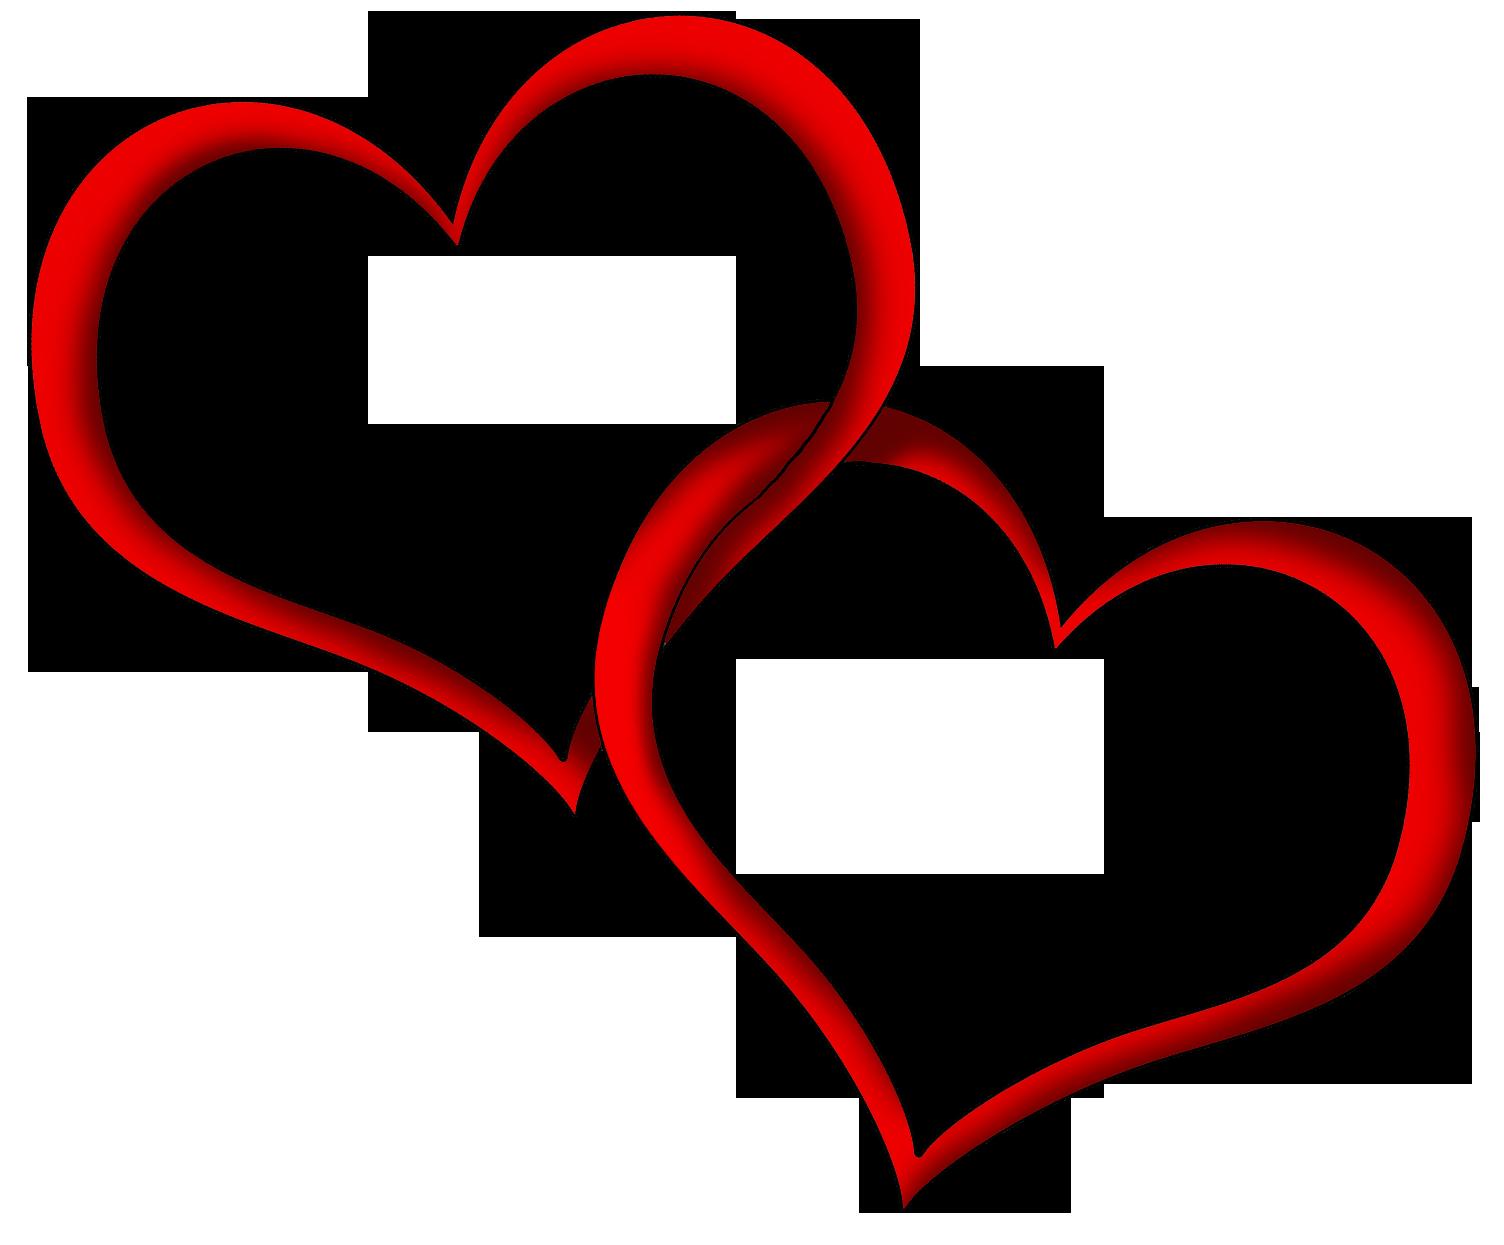 Hearts Heart Clipart-Hearts heart clipart-9